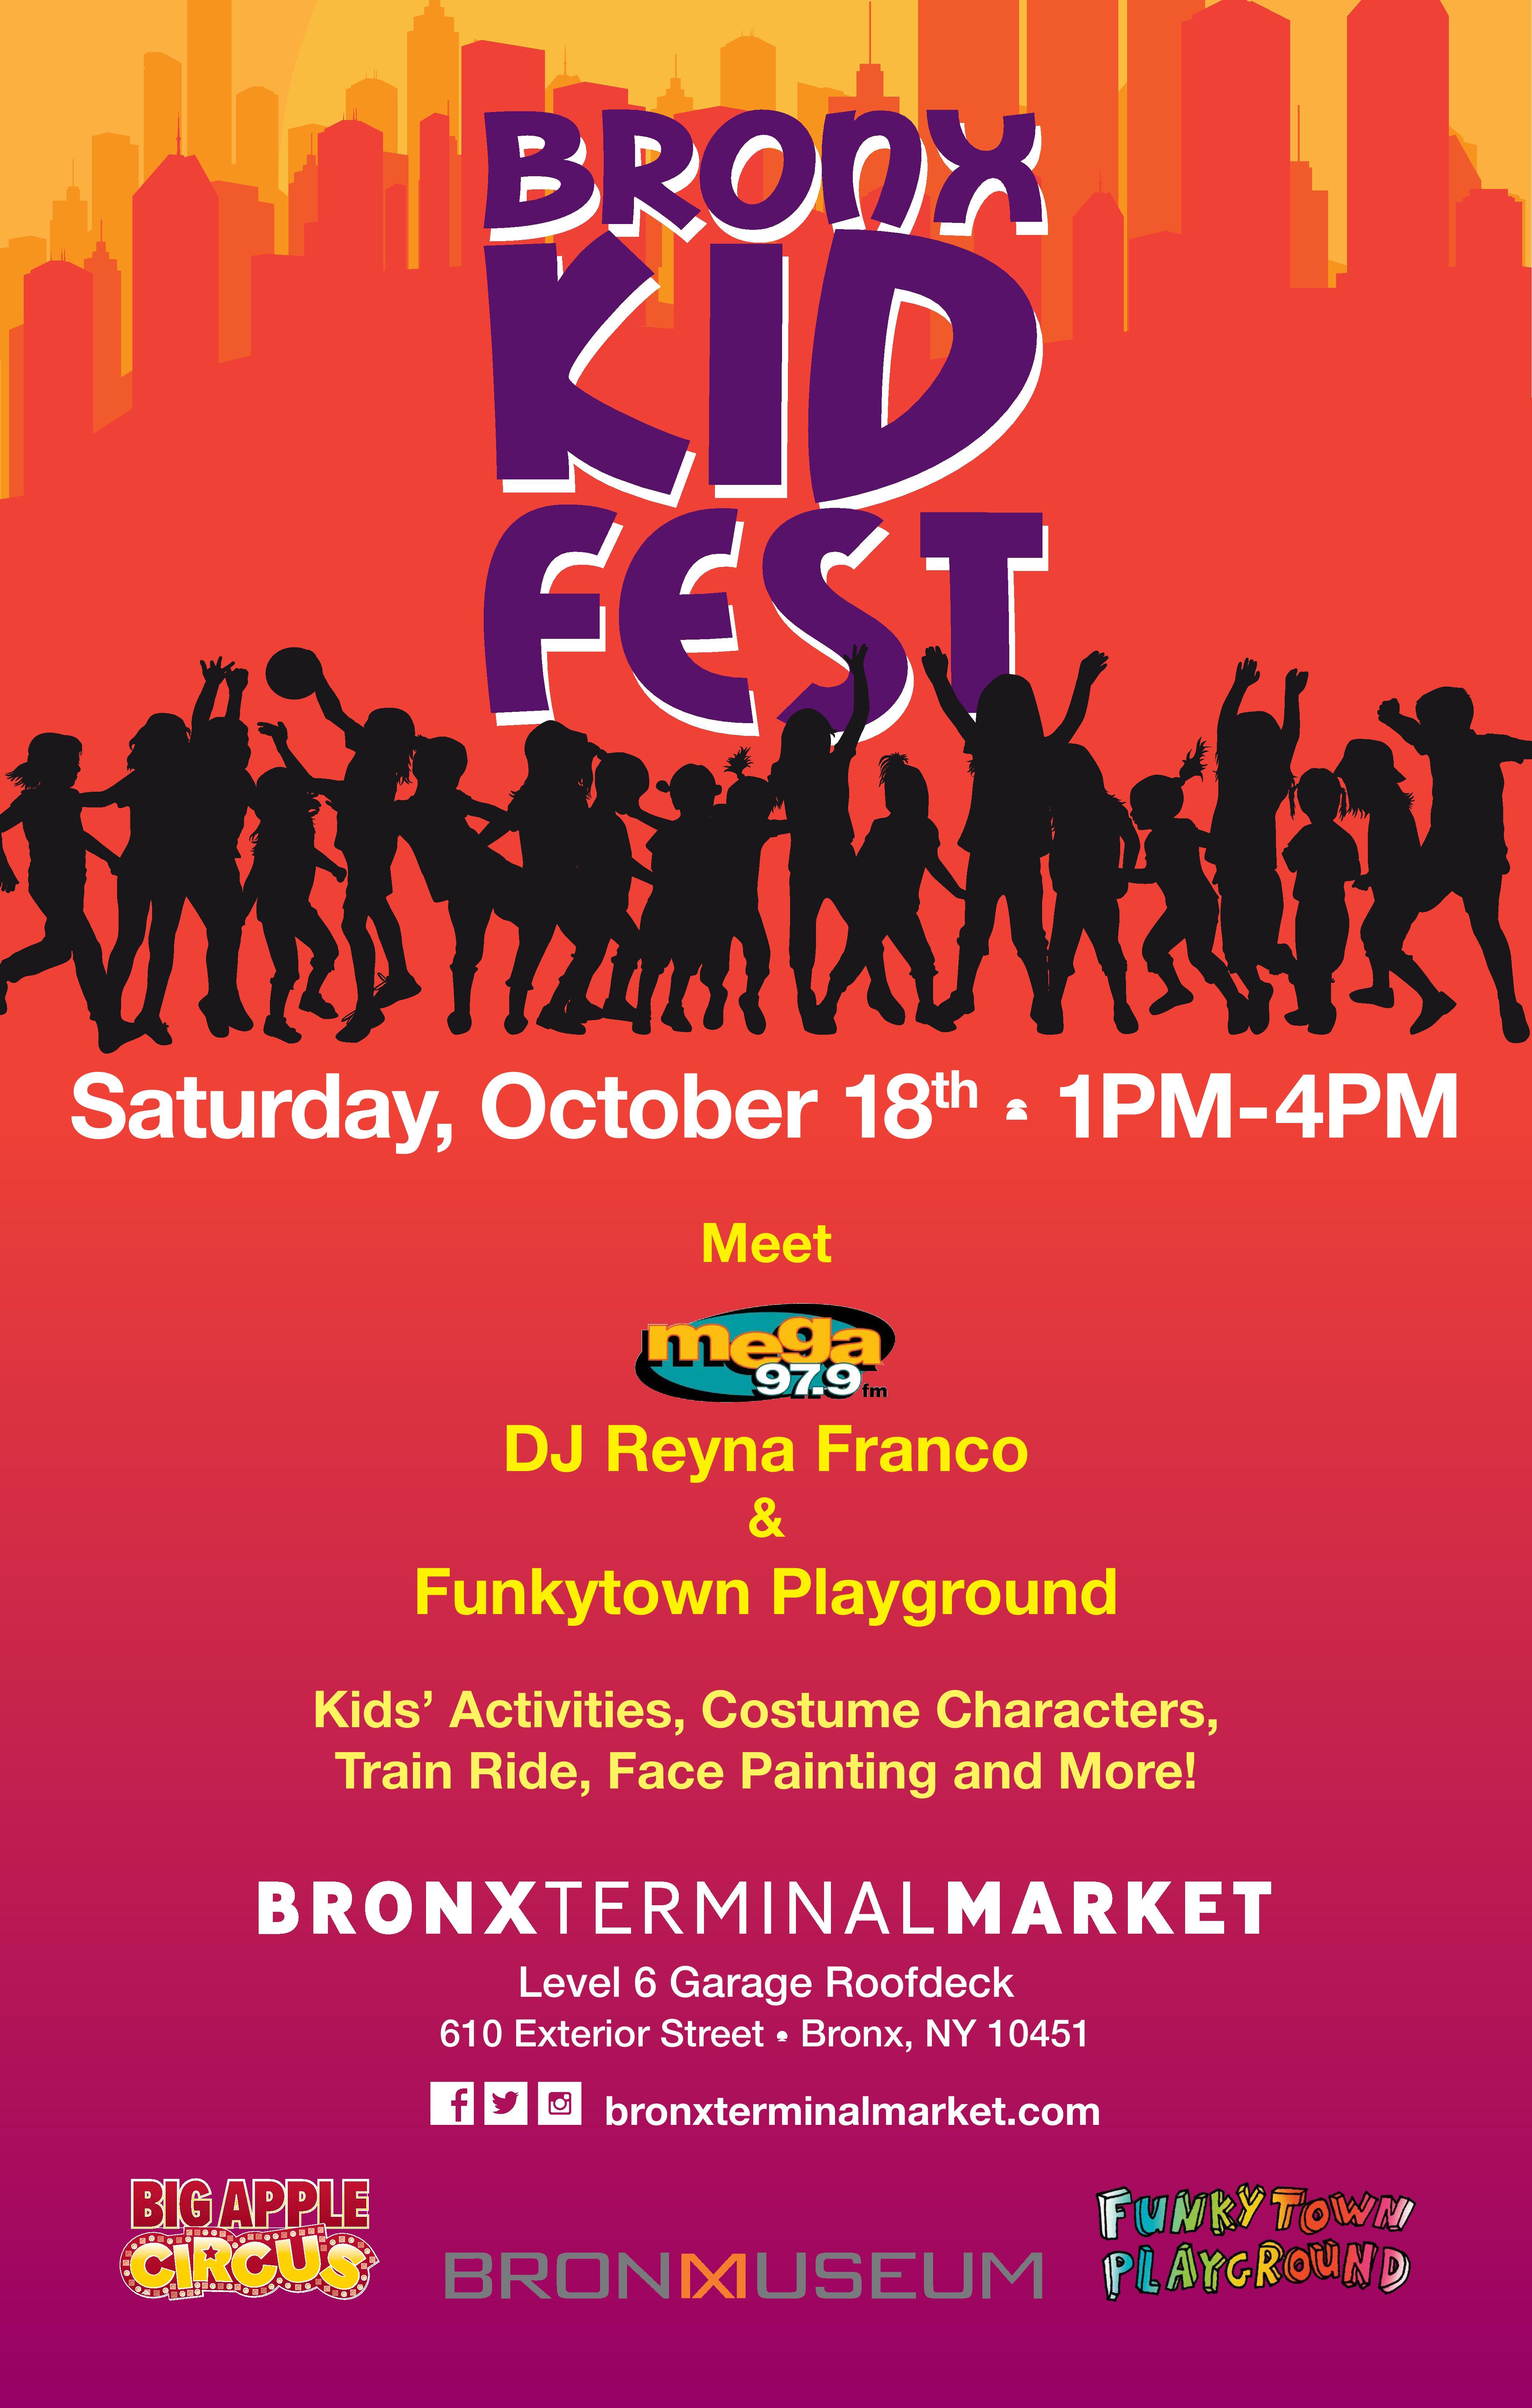 Bronx Kids Fest at Bronx Terminal Market